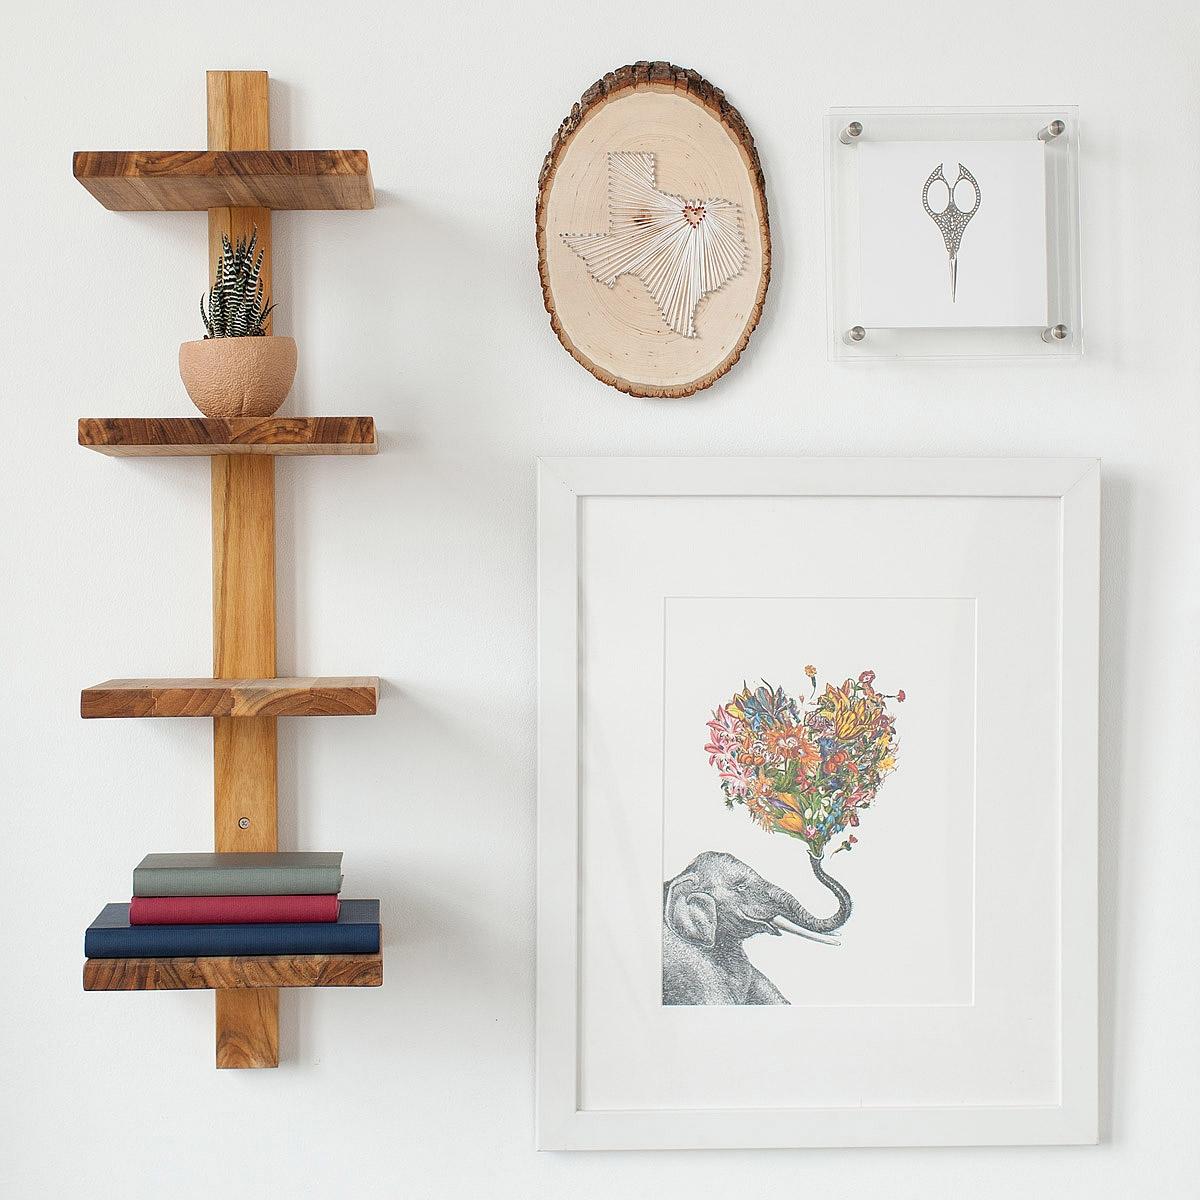 Minimalist Teak Wall Shelf Vertical Shelves Stacked Shelves Inside Wall Shelf (Image 7 of 15)